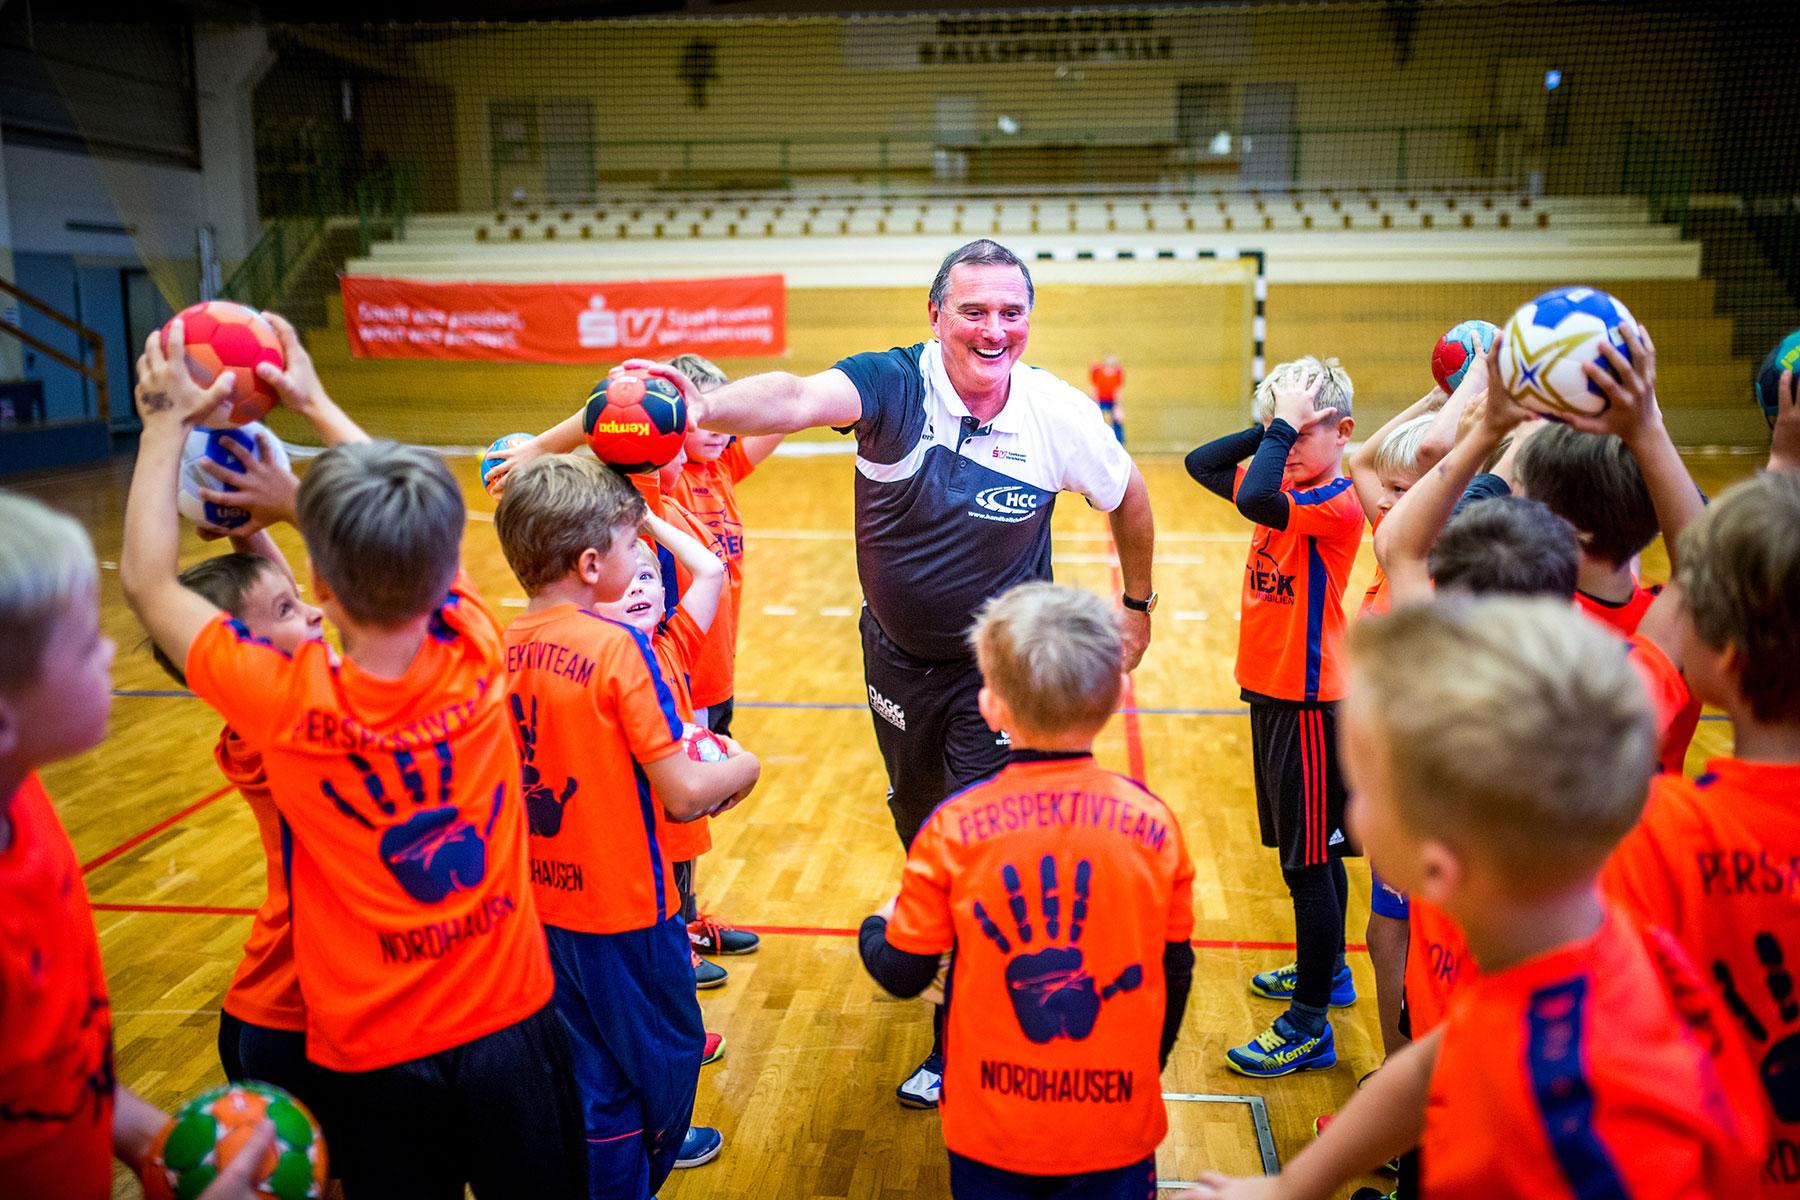 201809_Handballcamp_NDH (44)